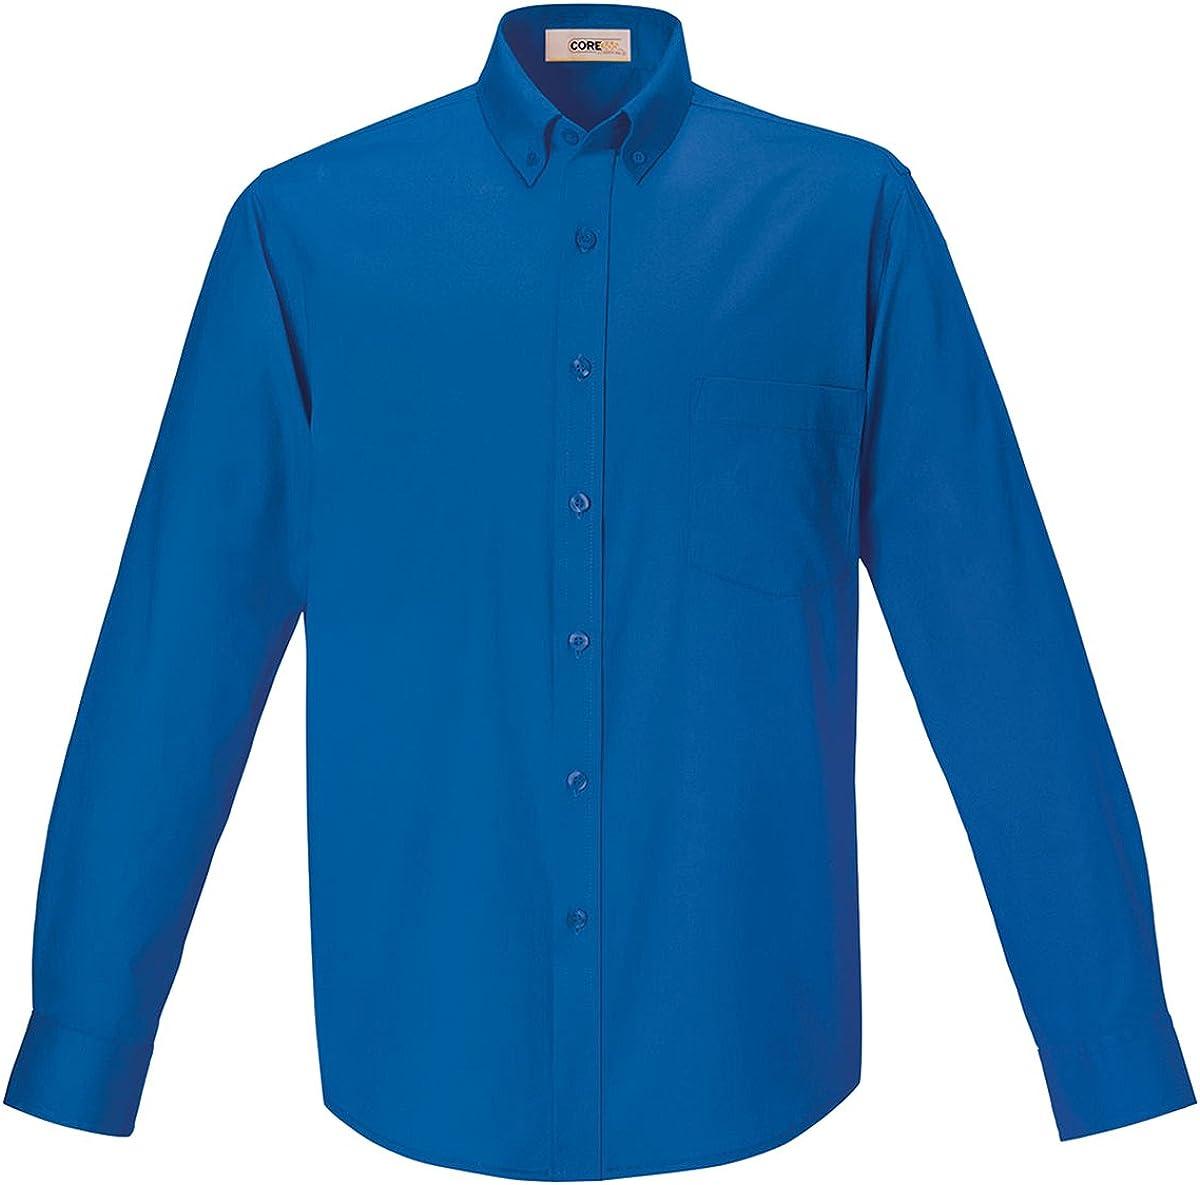 88193 Core 365 Operate Mens Long Sleeve Twill Shirt